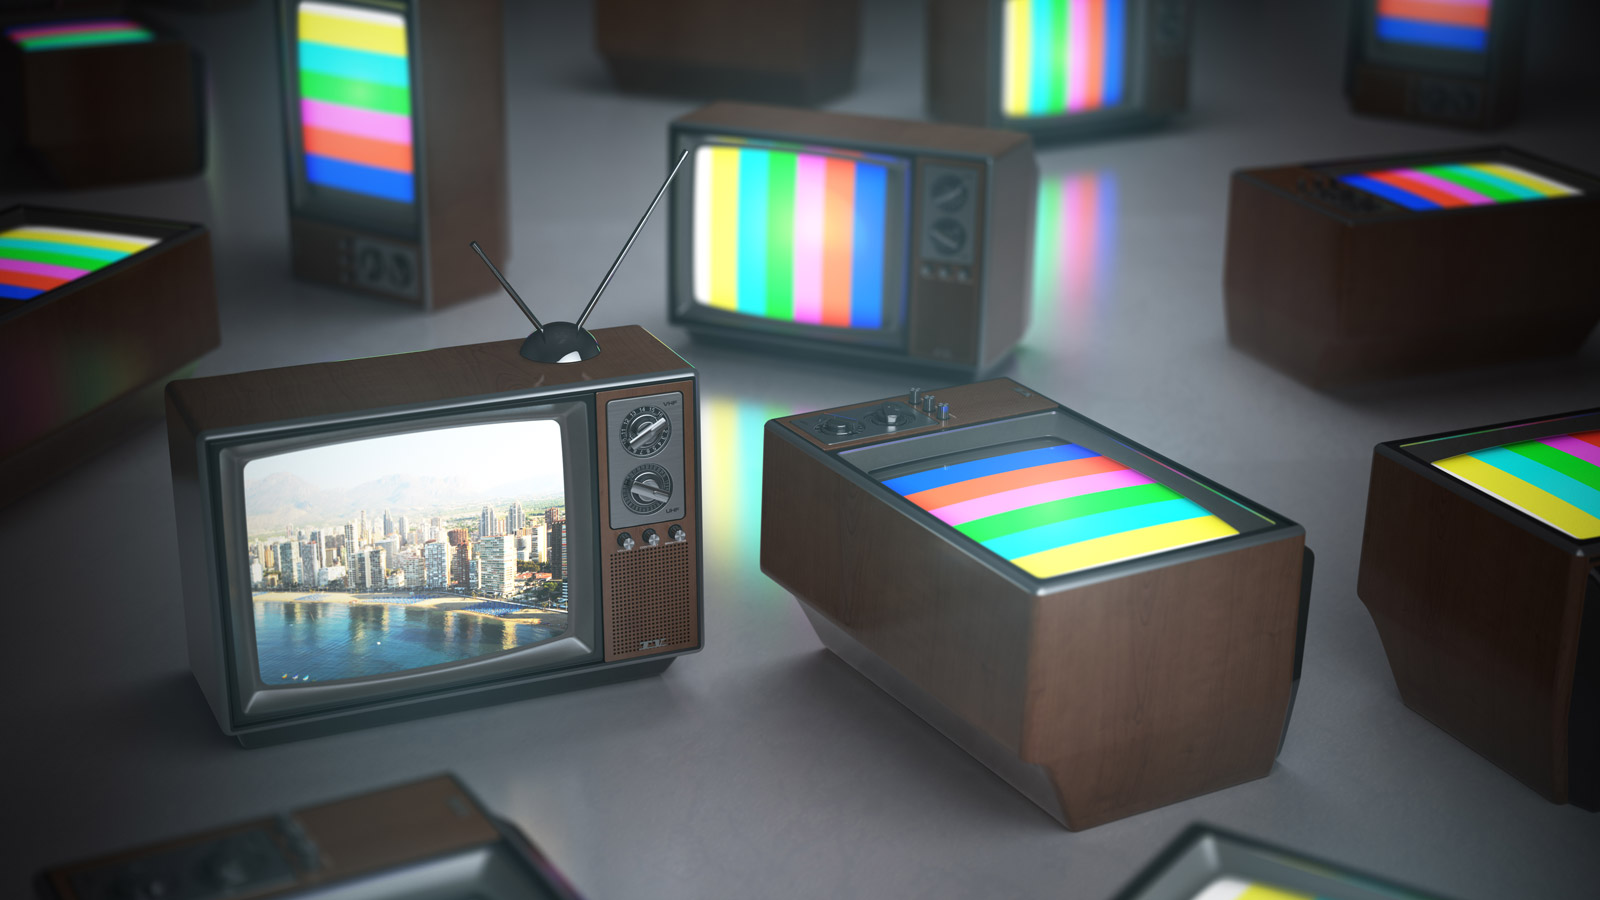 HAVAS MEDIA z nową telewizyjną usługą TV mediarun vintage tv havas media usluga 2020